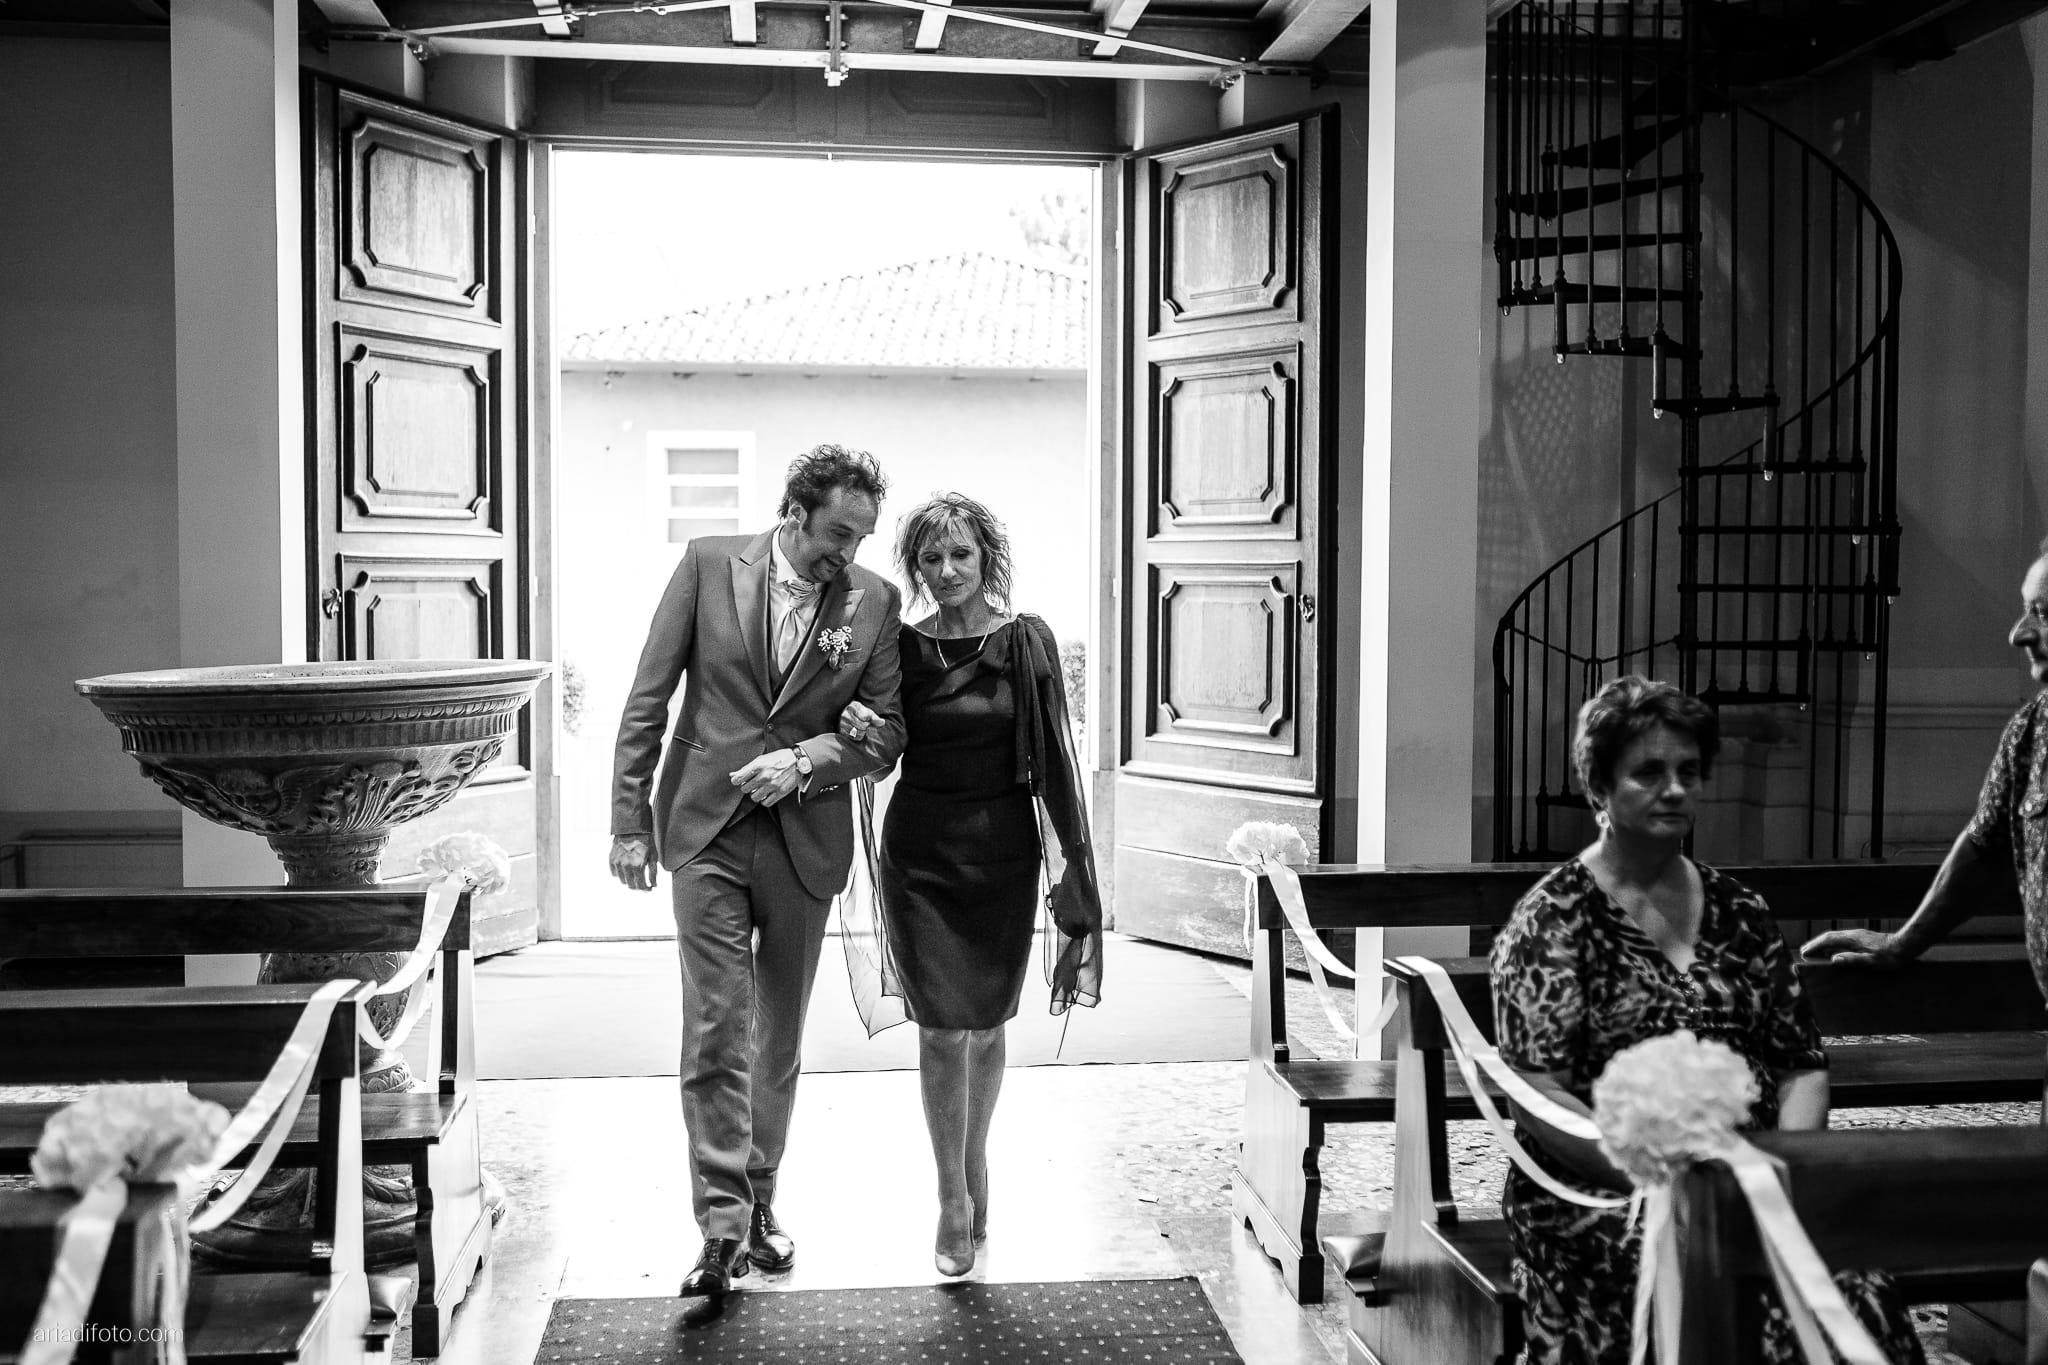 Valentina Francesco Matrimonio Chiesa San Giorgio Martire Pagnacco Castello Villalta Fagagna Udine cerimonia ingresso sposo